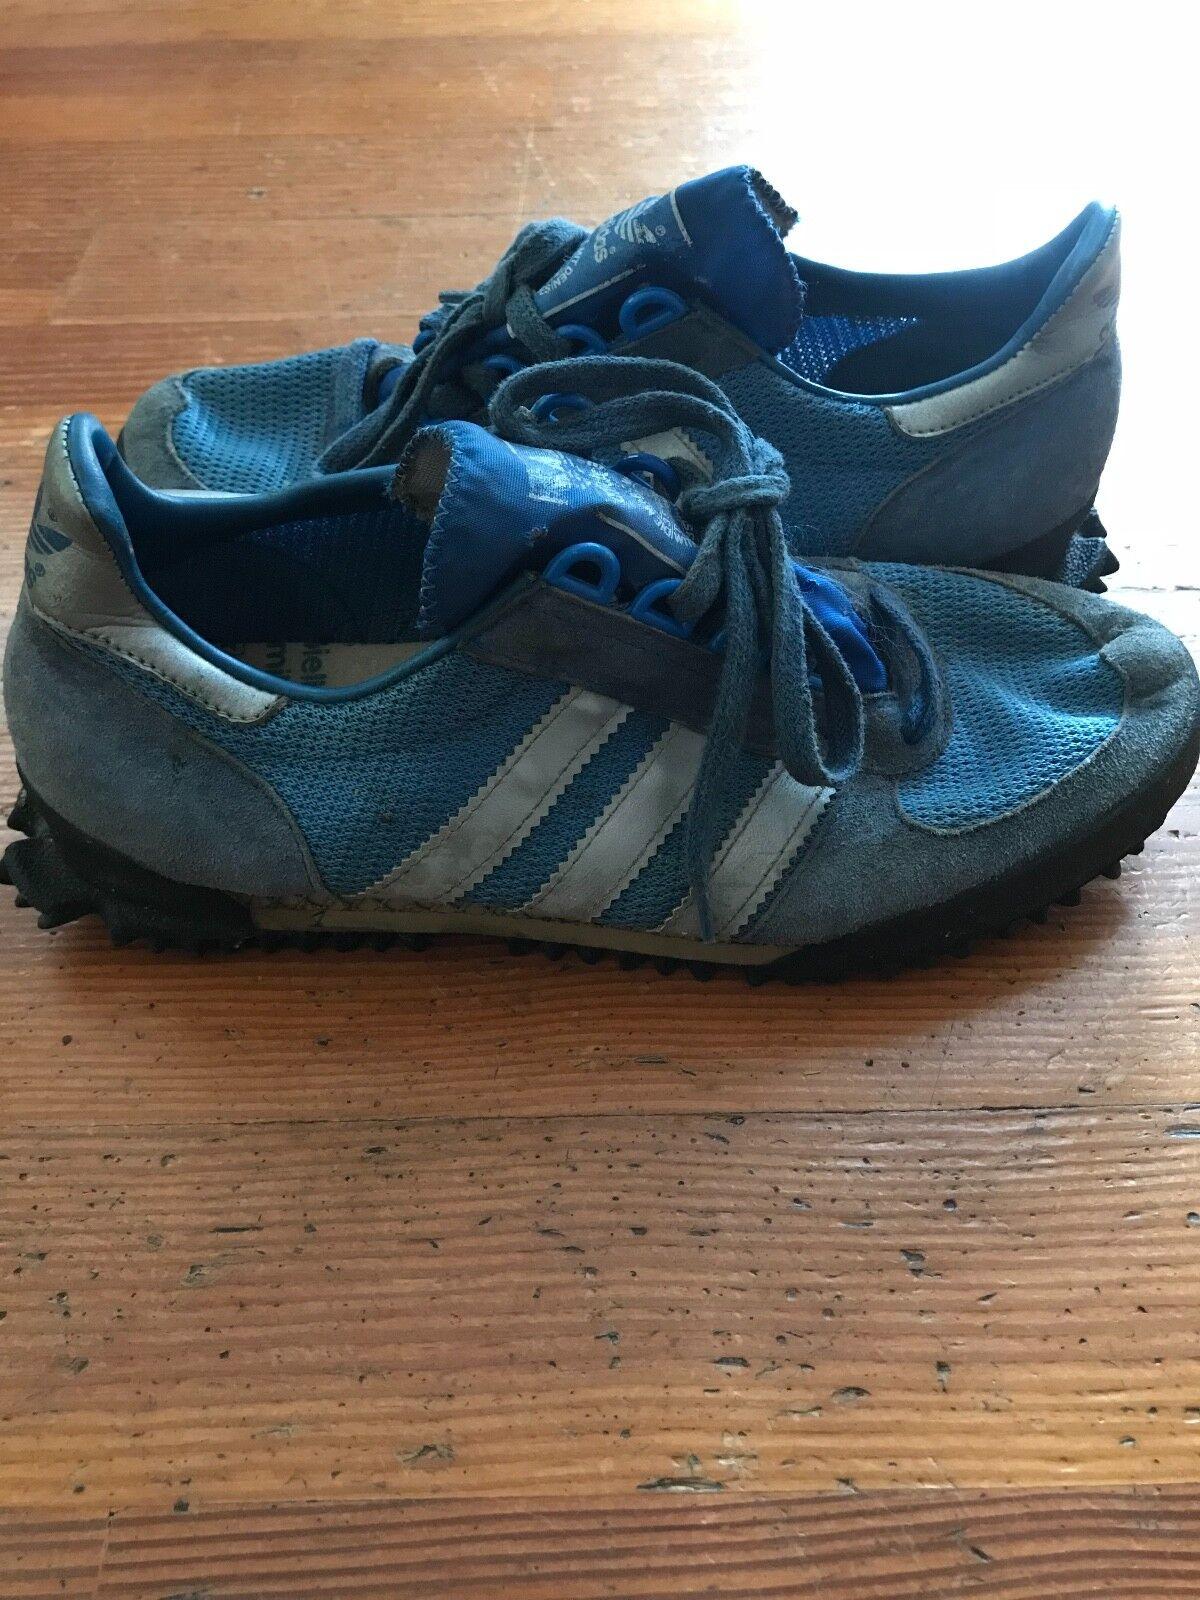 Adidas Marathon Trainer Made In Yugoslavia 70's 80's Vintage Comfortable